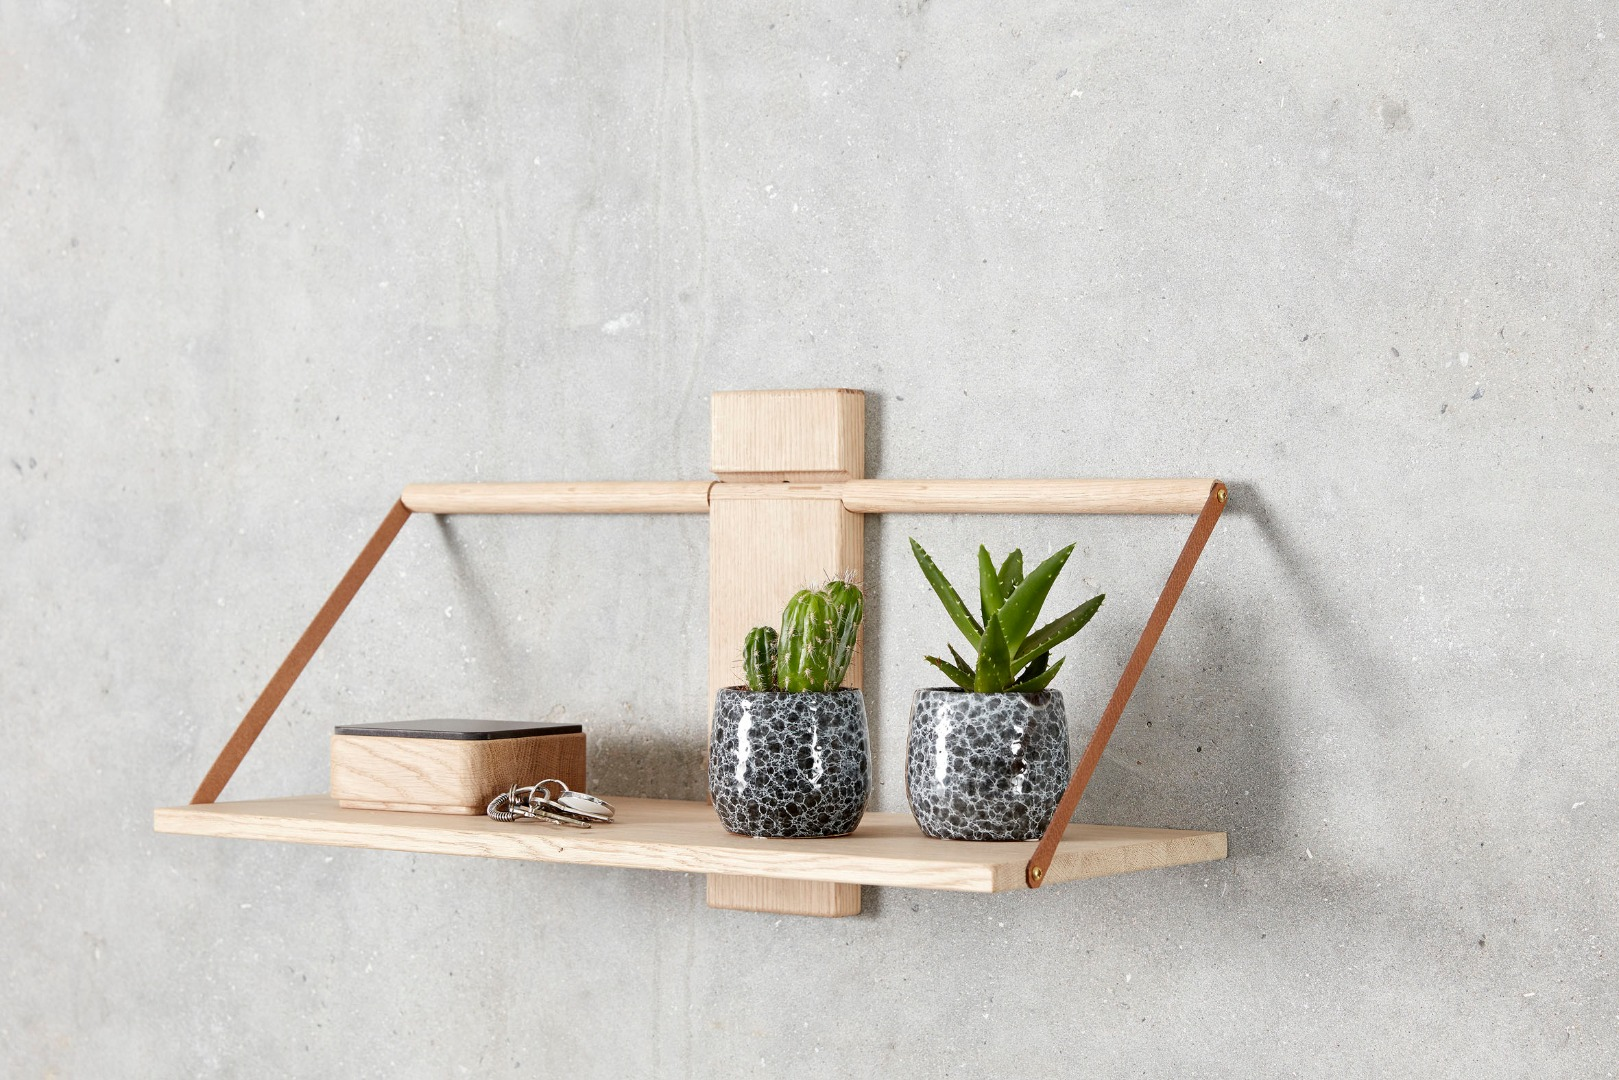 shelf-wood-wall-2.jpg